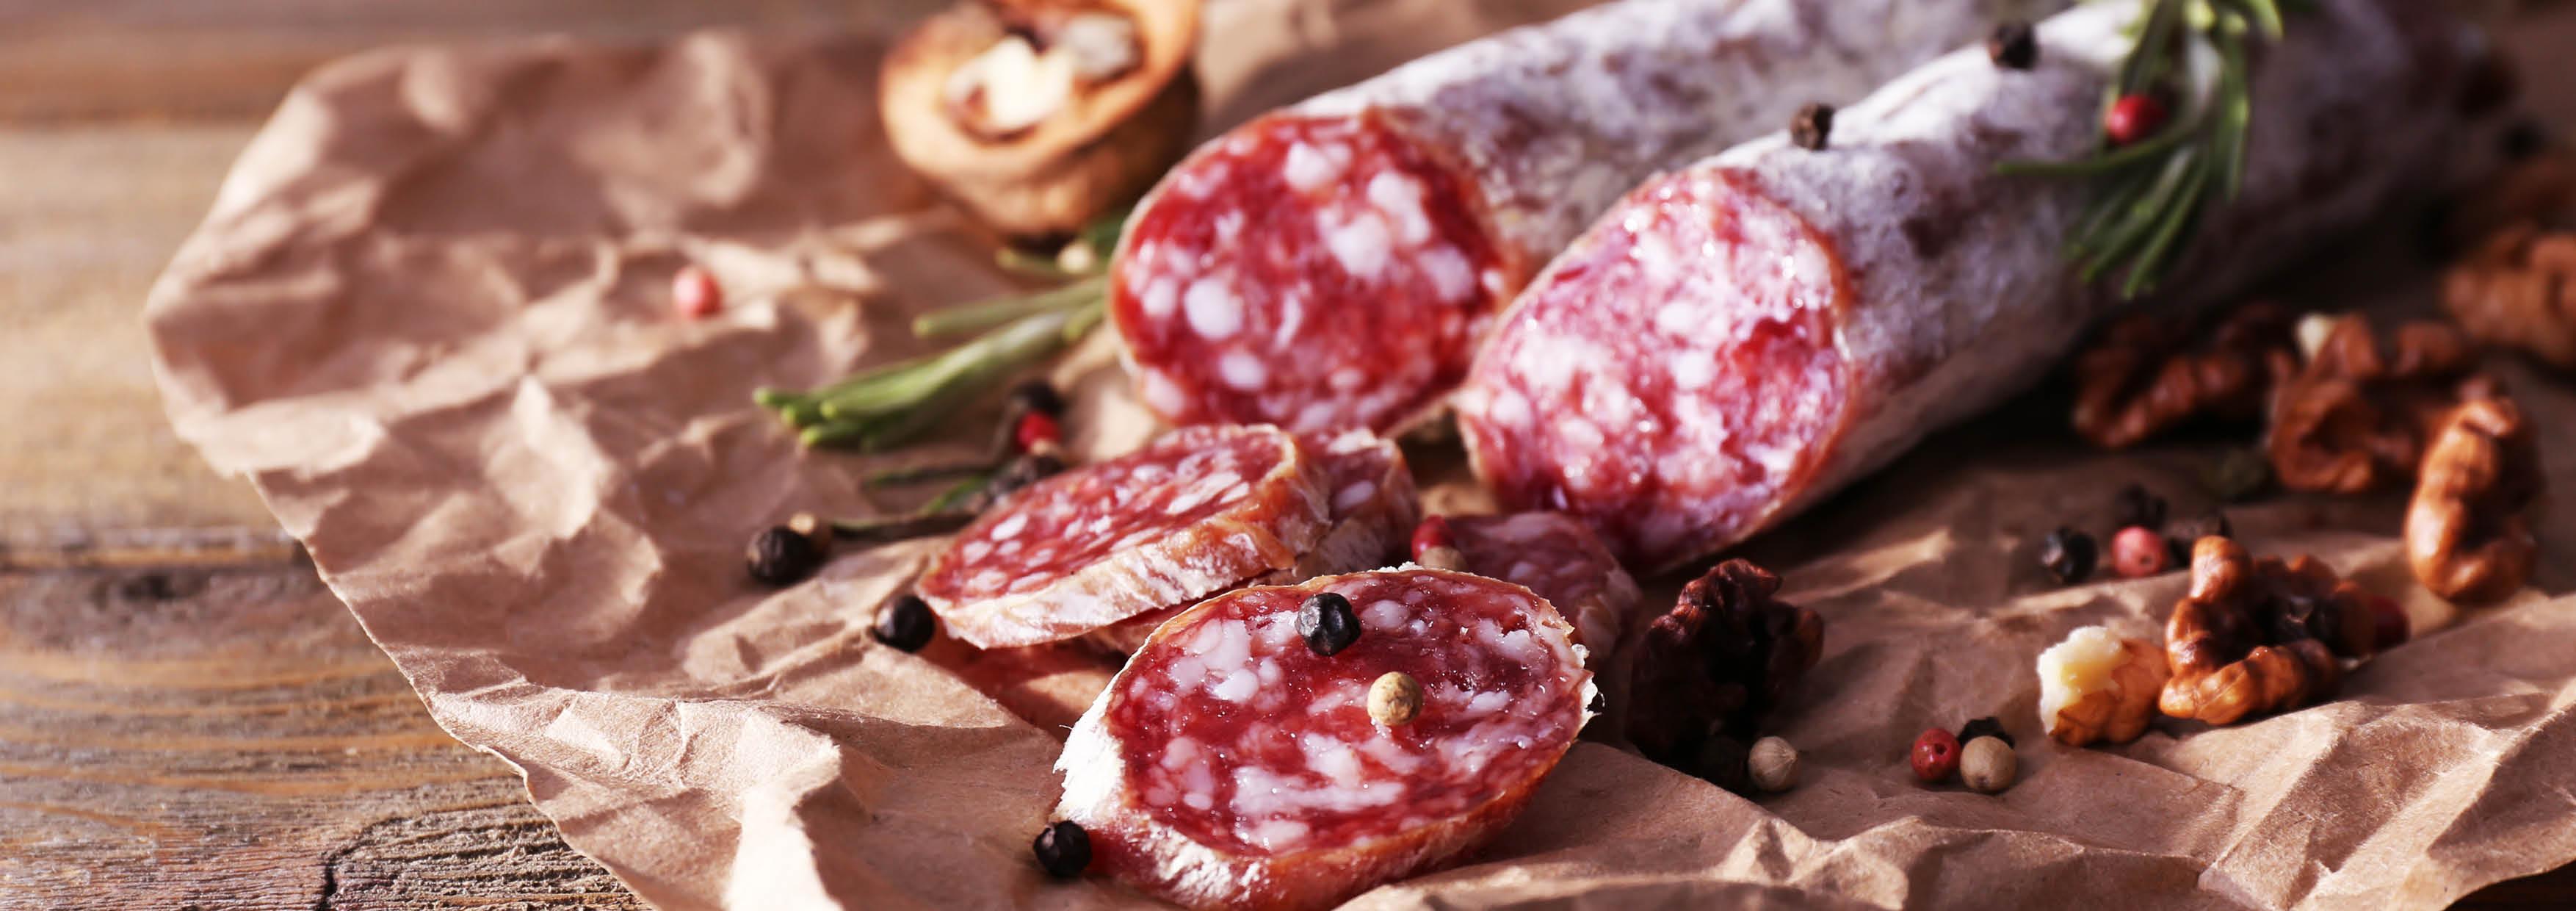 Swiss Deli Traditional Delicatessen  Sausages, Salami, Ham, Recipies